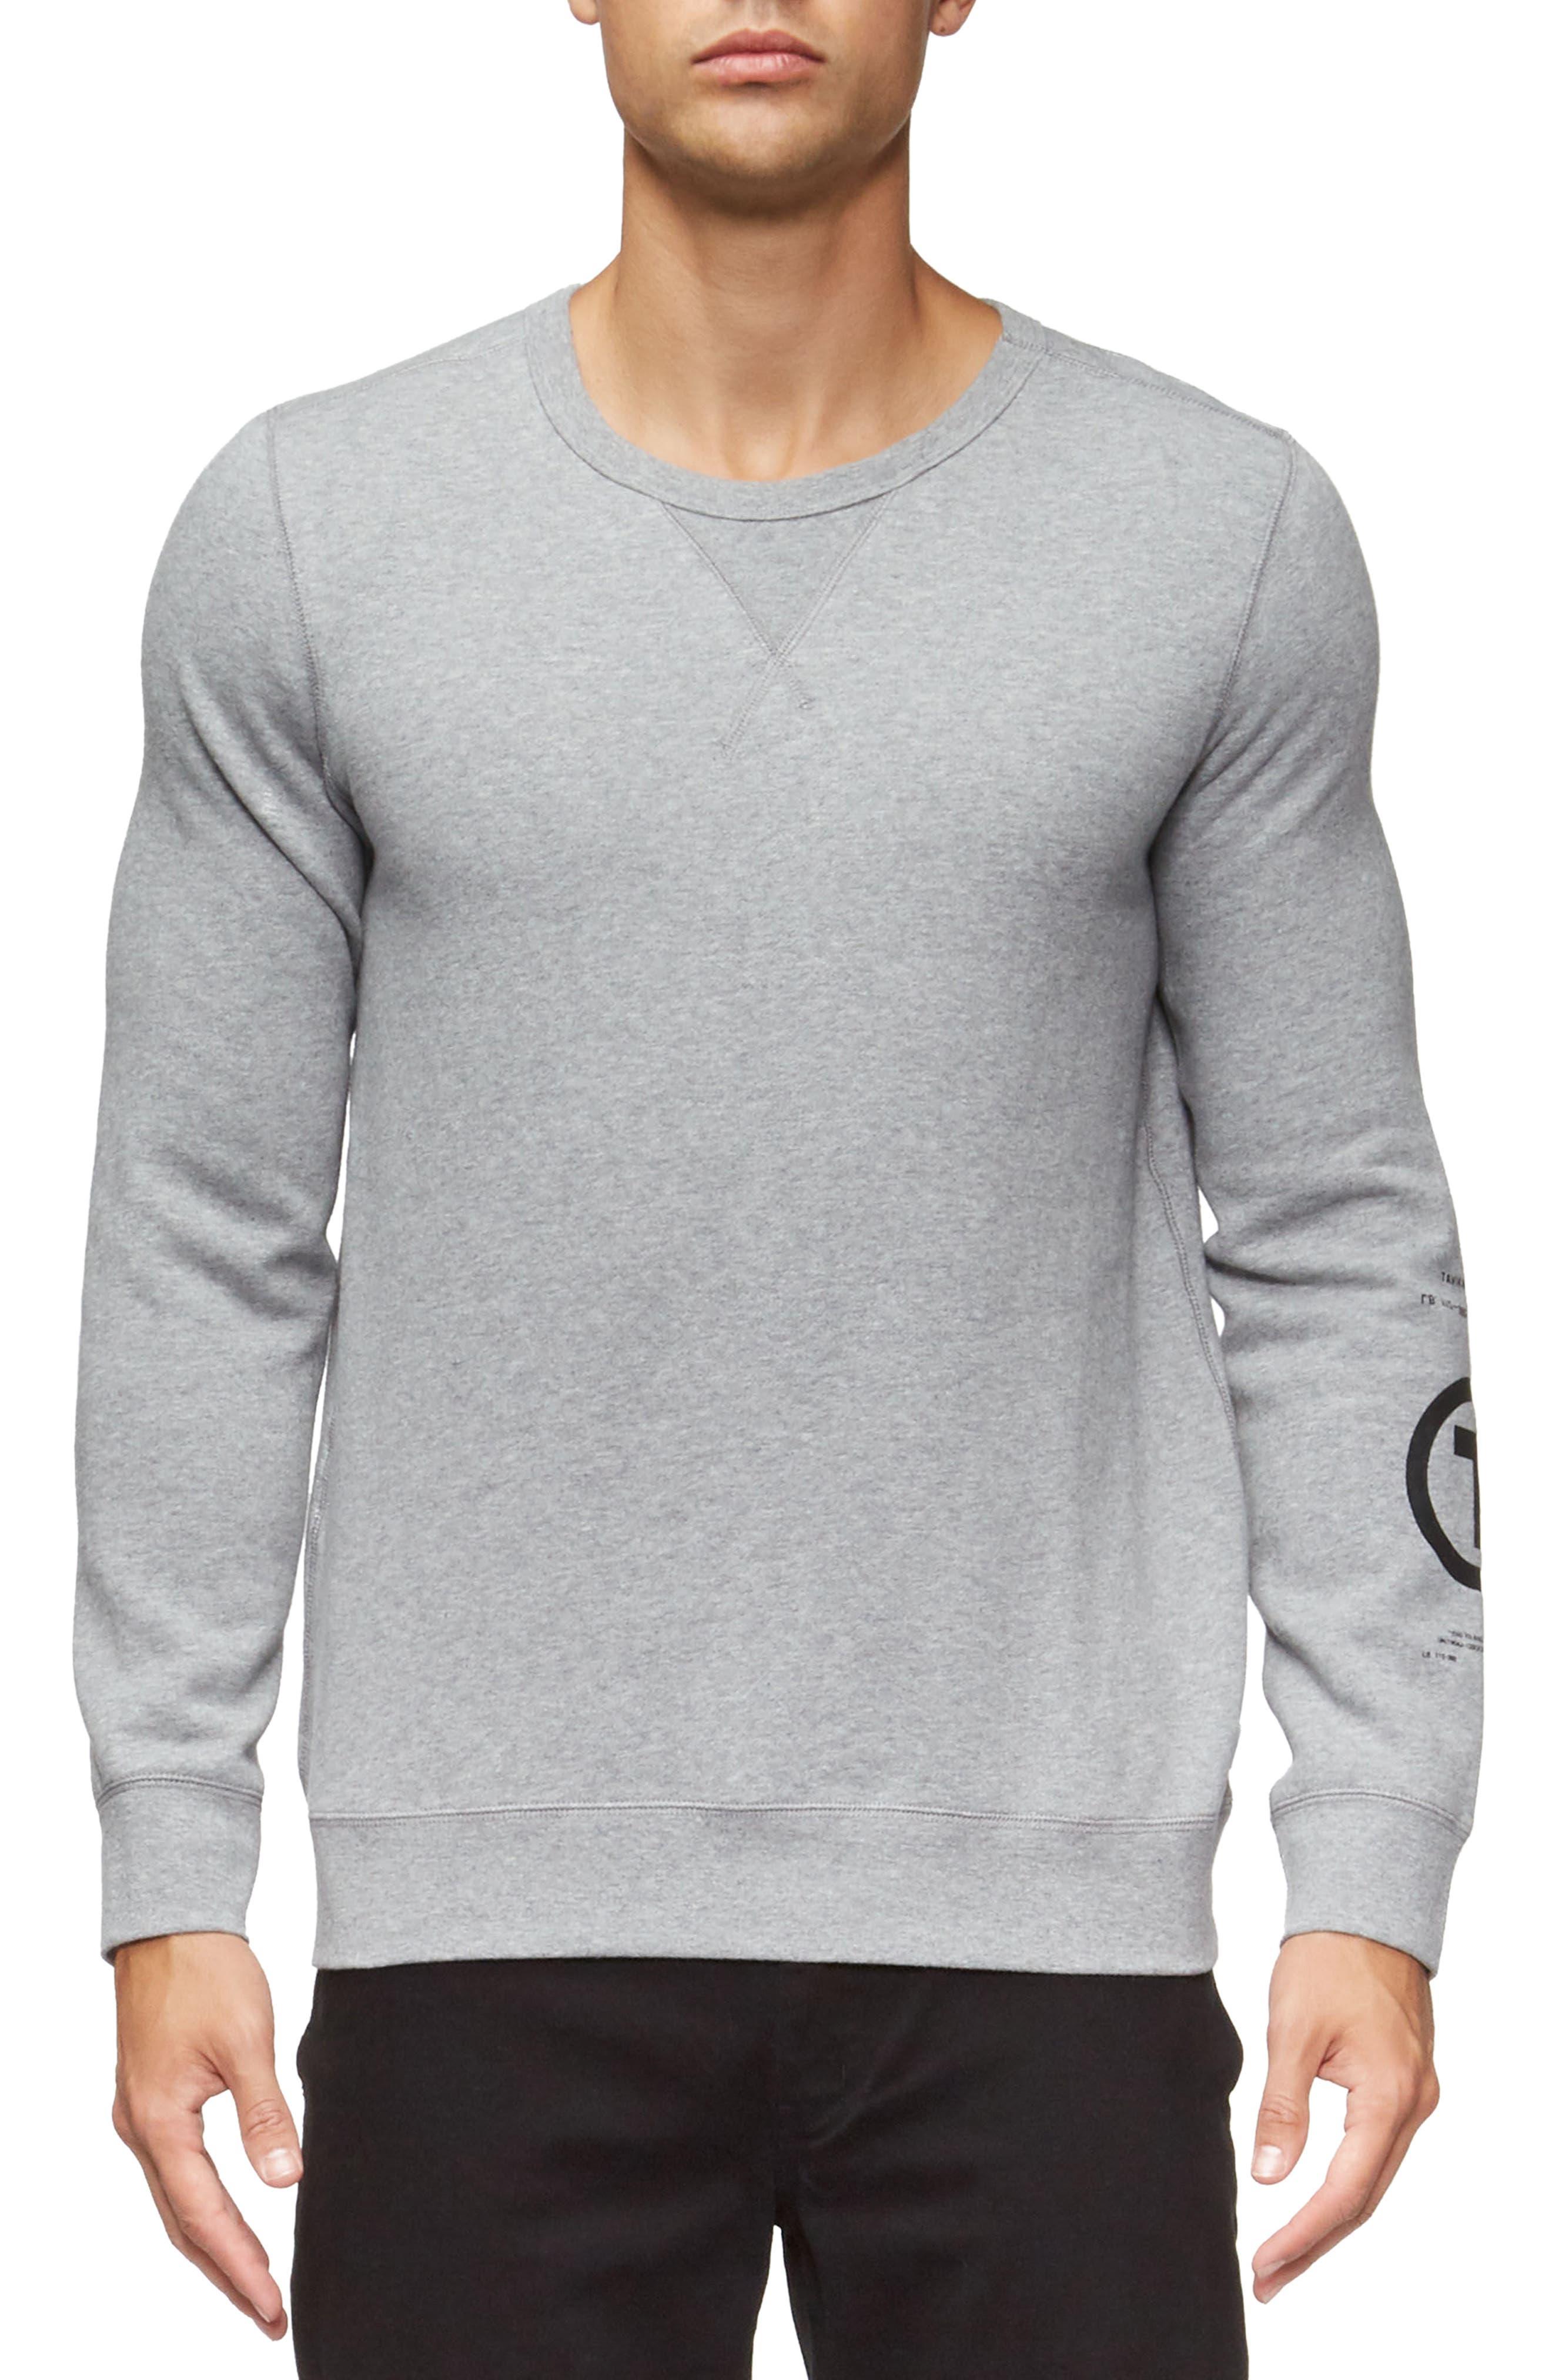 Marina Sweatshirt,                         Main,                         color, 020